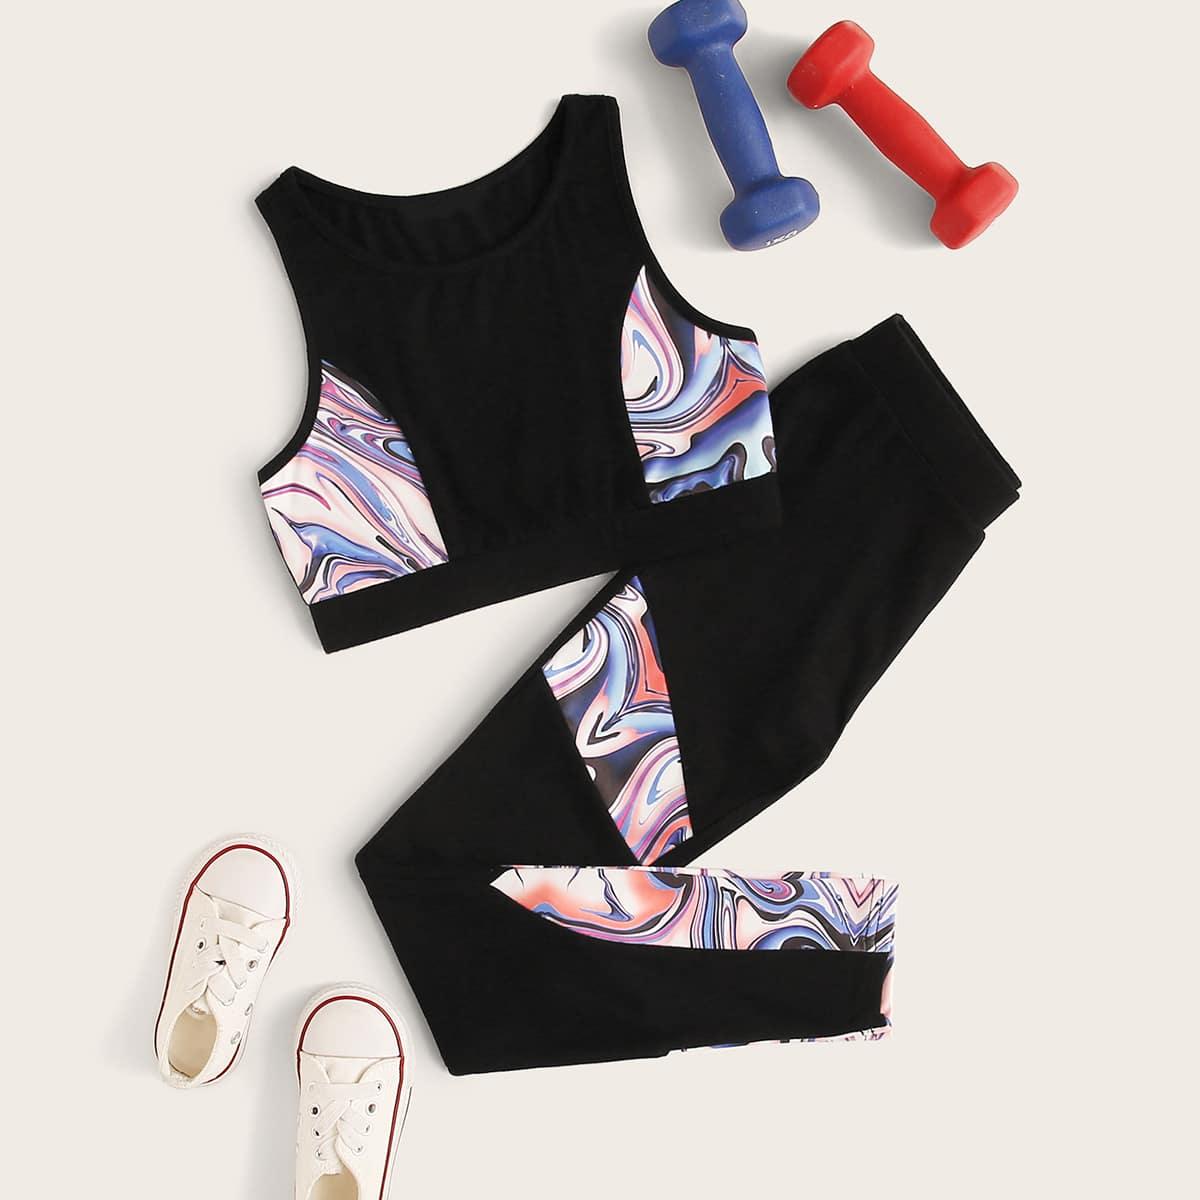 SHEIN / Girls Colorblock Tank Top and Leggings Set